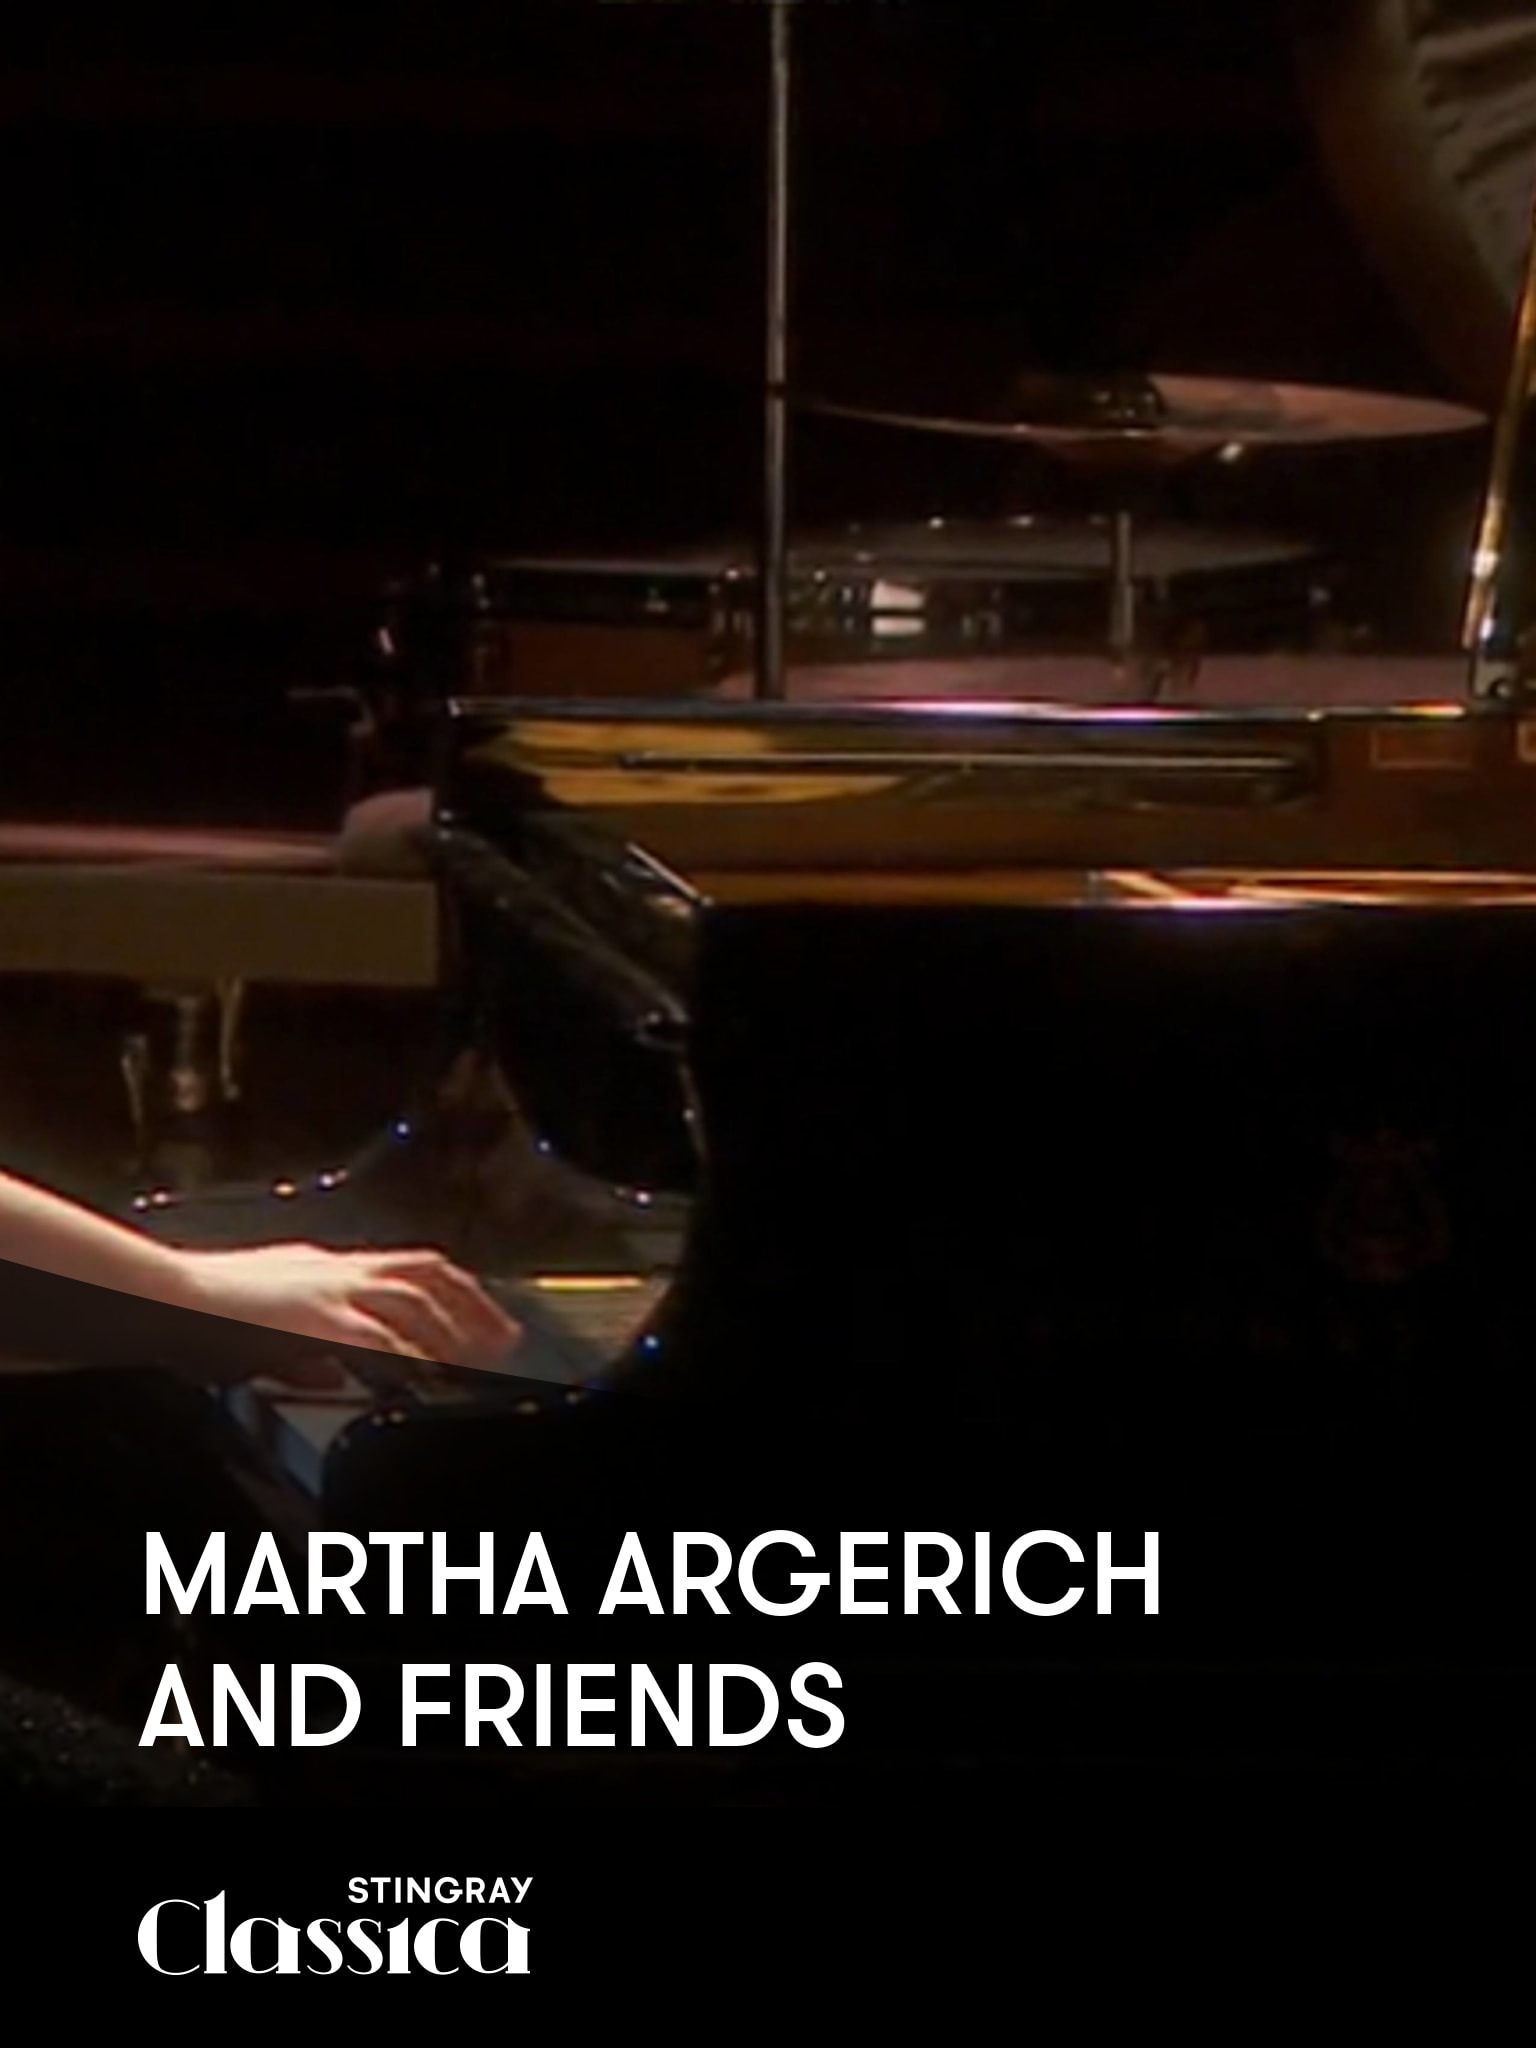 Martha Argerich and Friends